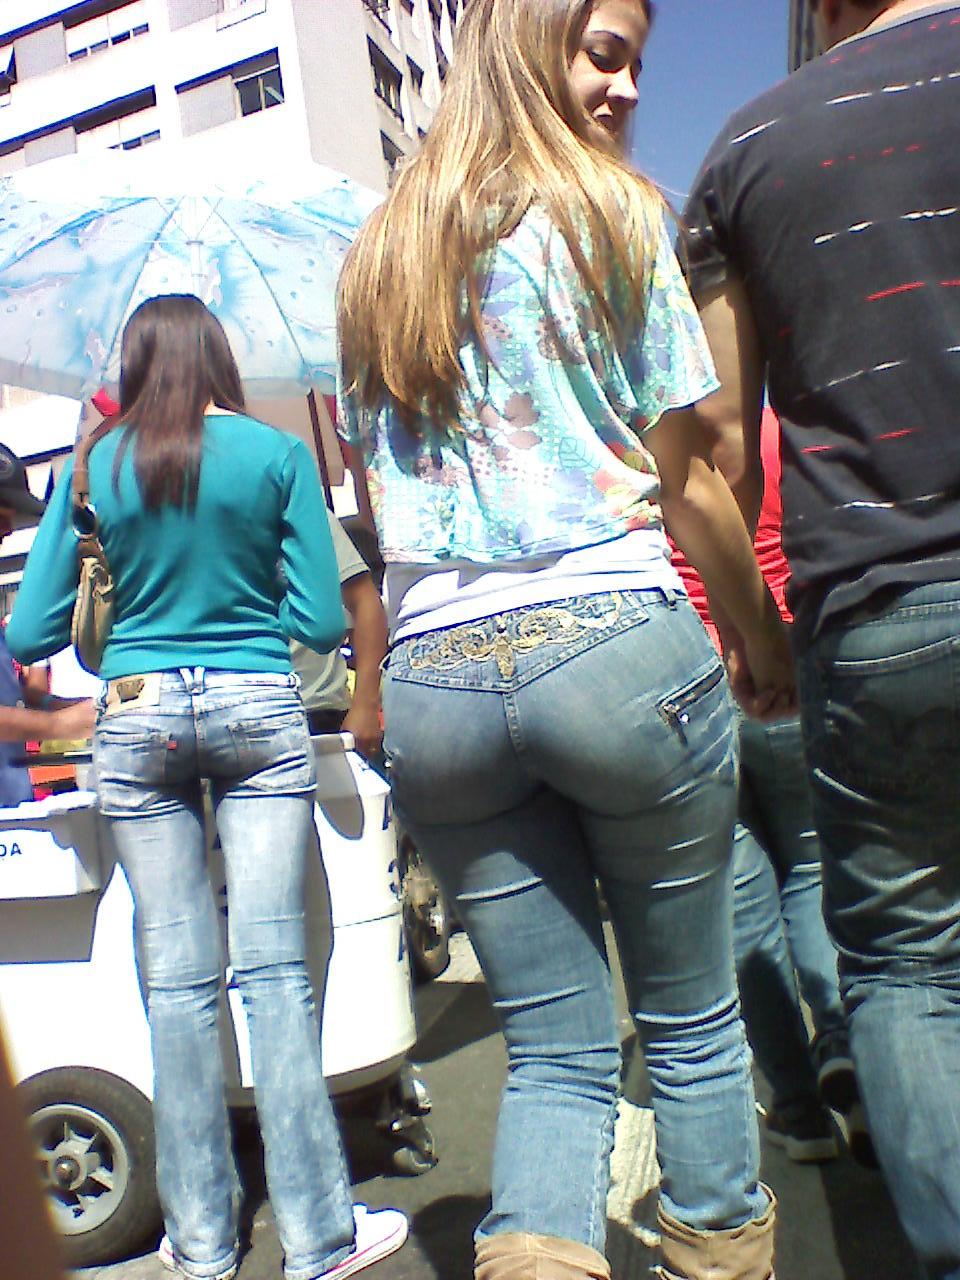 Gostosa De Calca Jeans